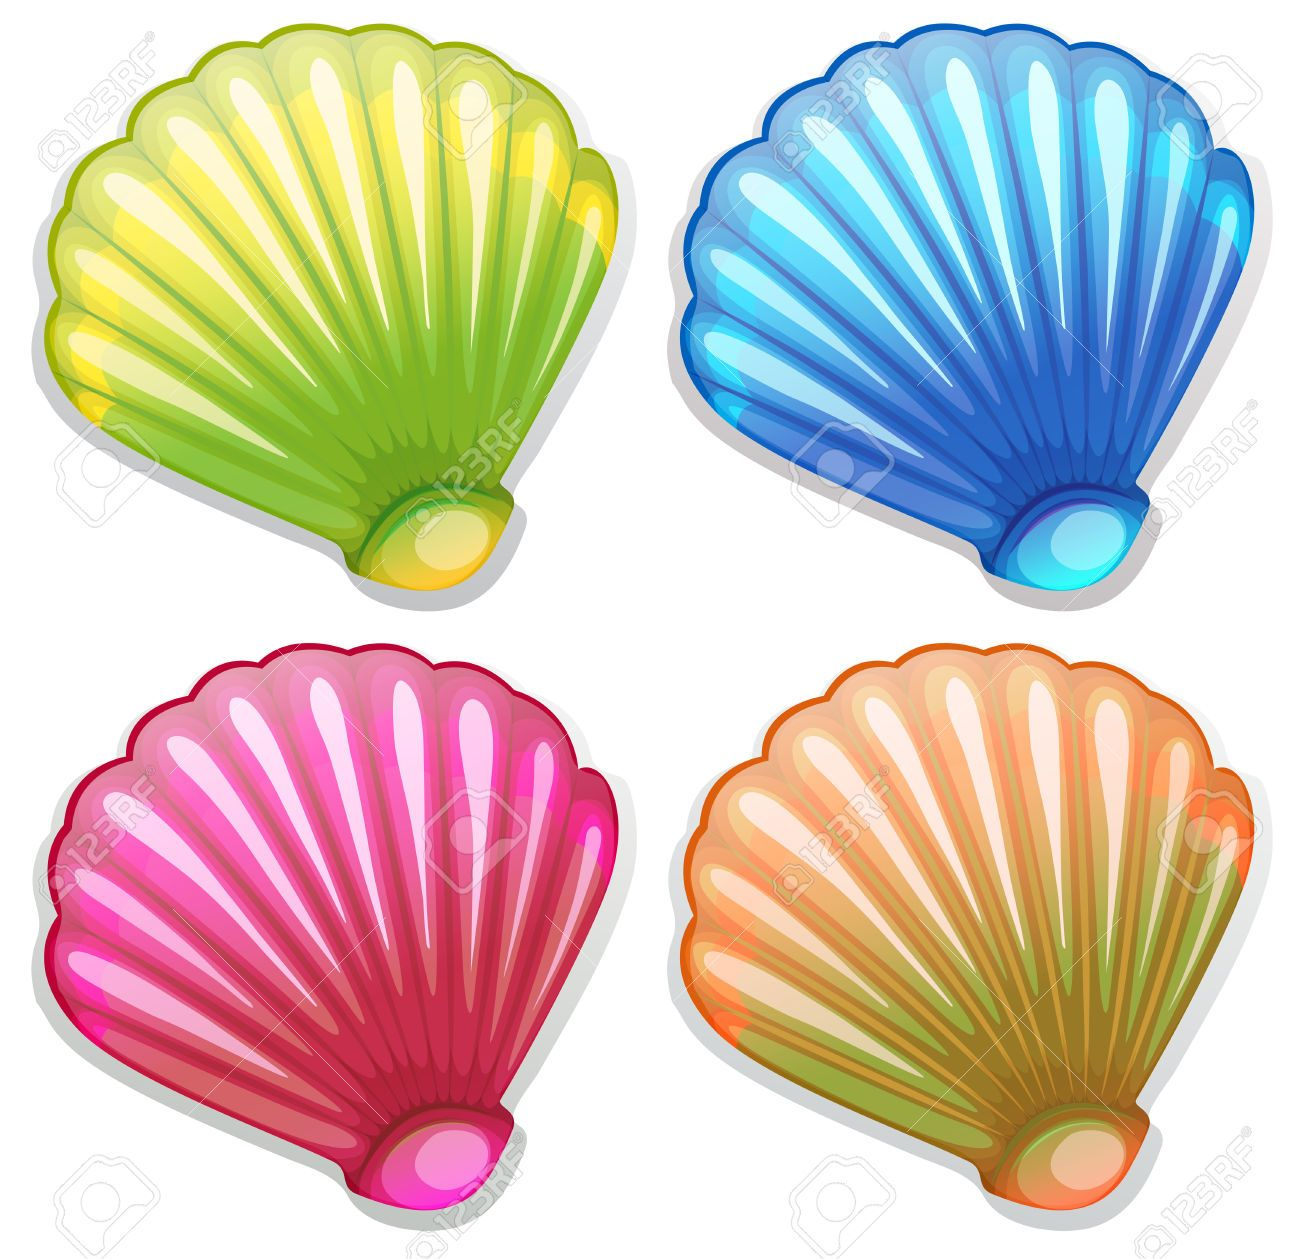 Seashell seashells in little. Shell clipart colorful